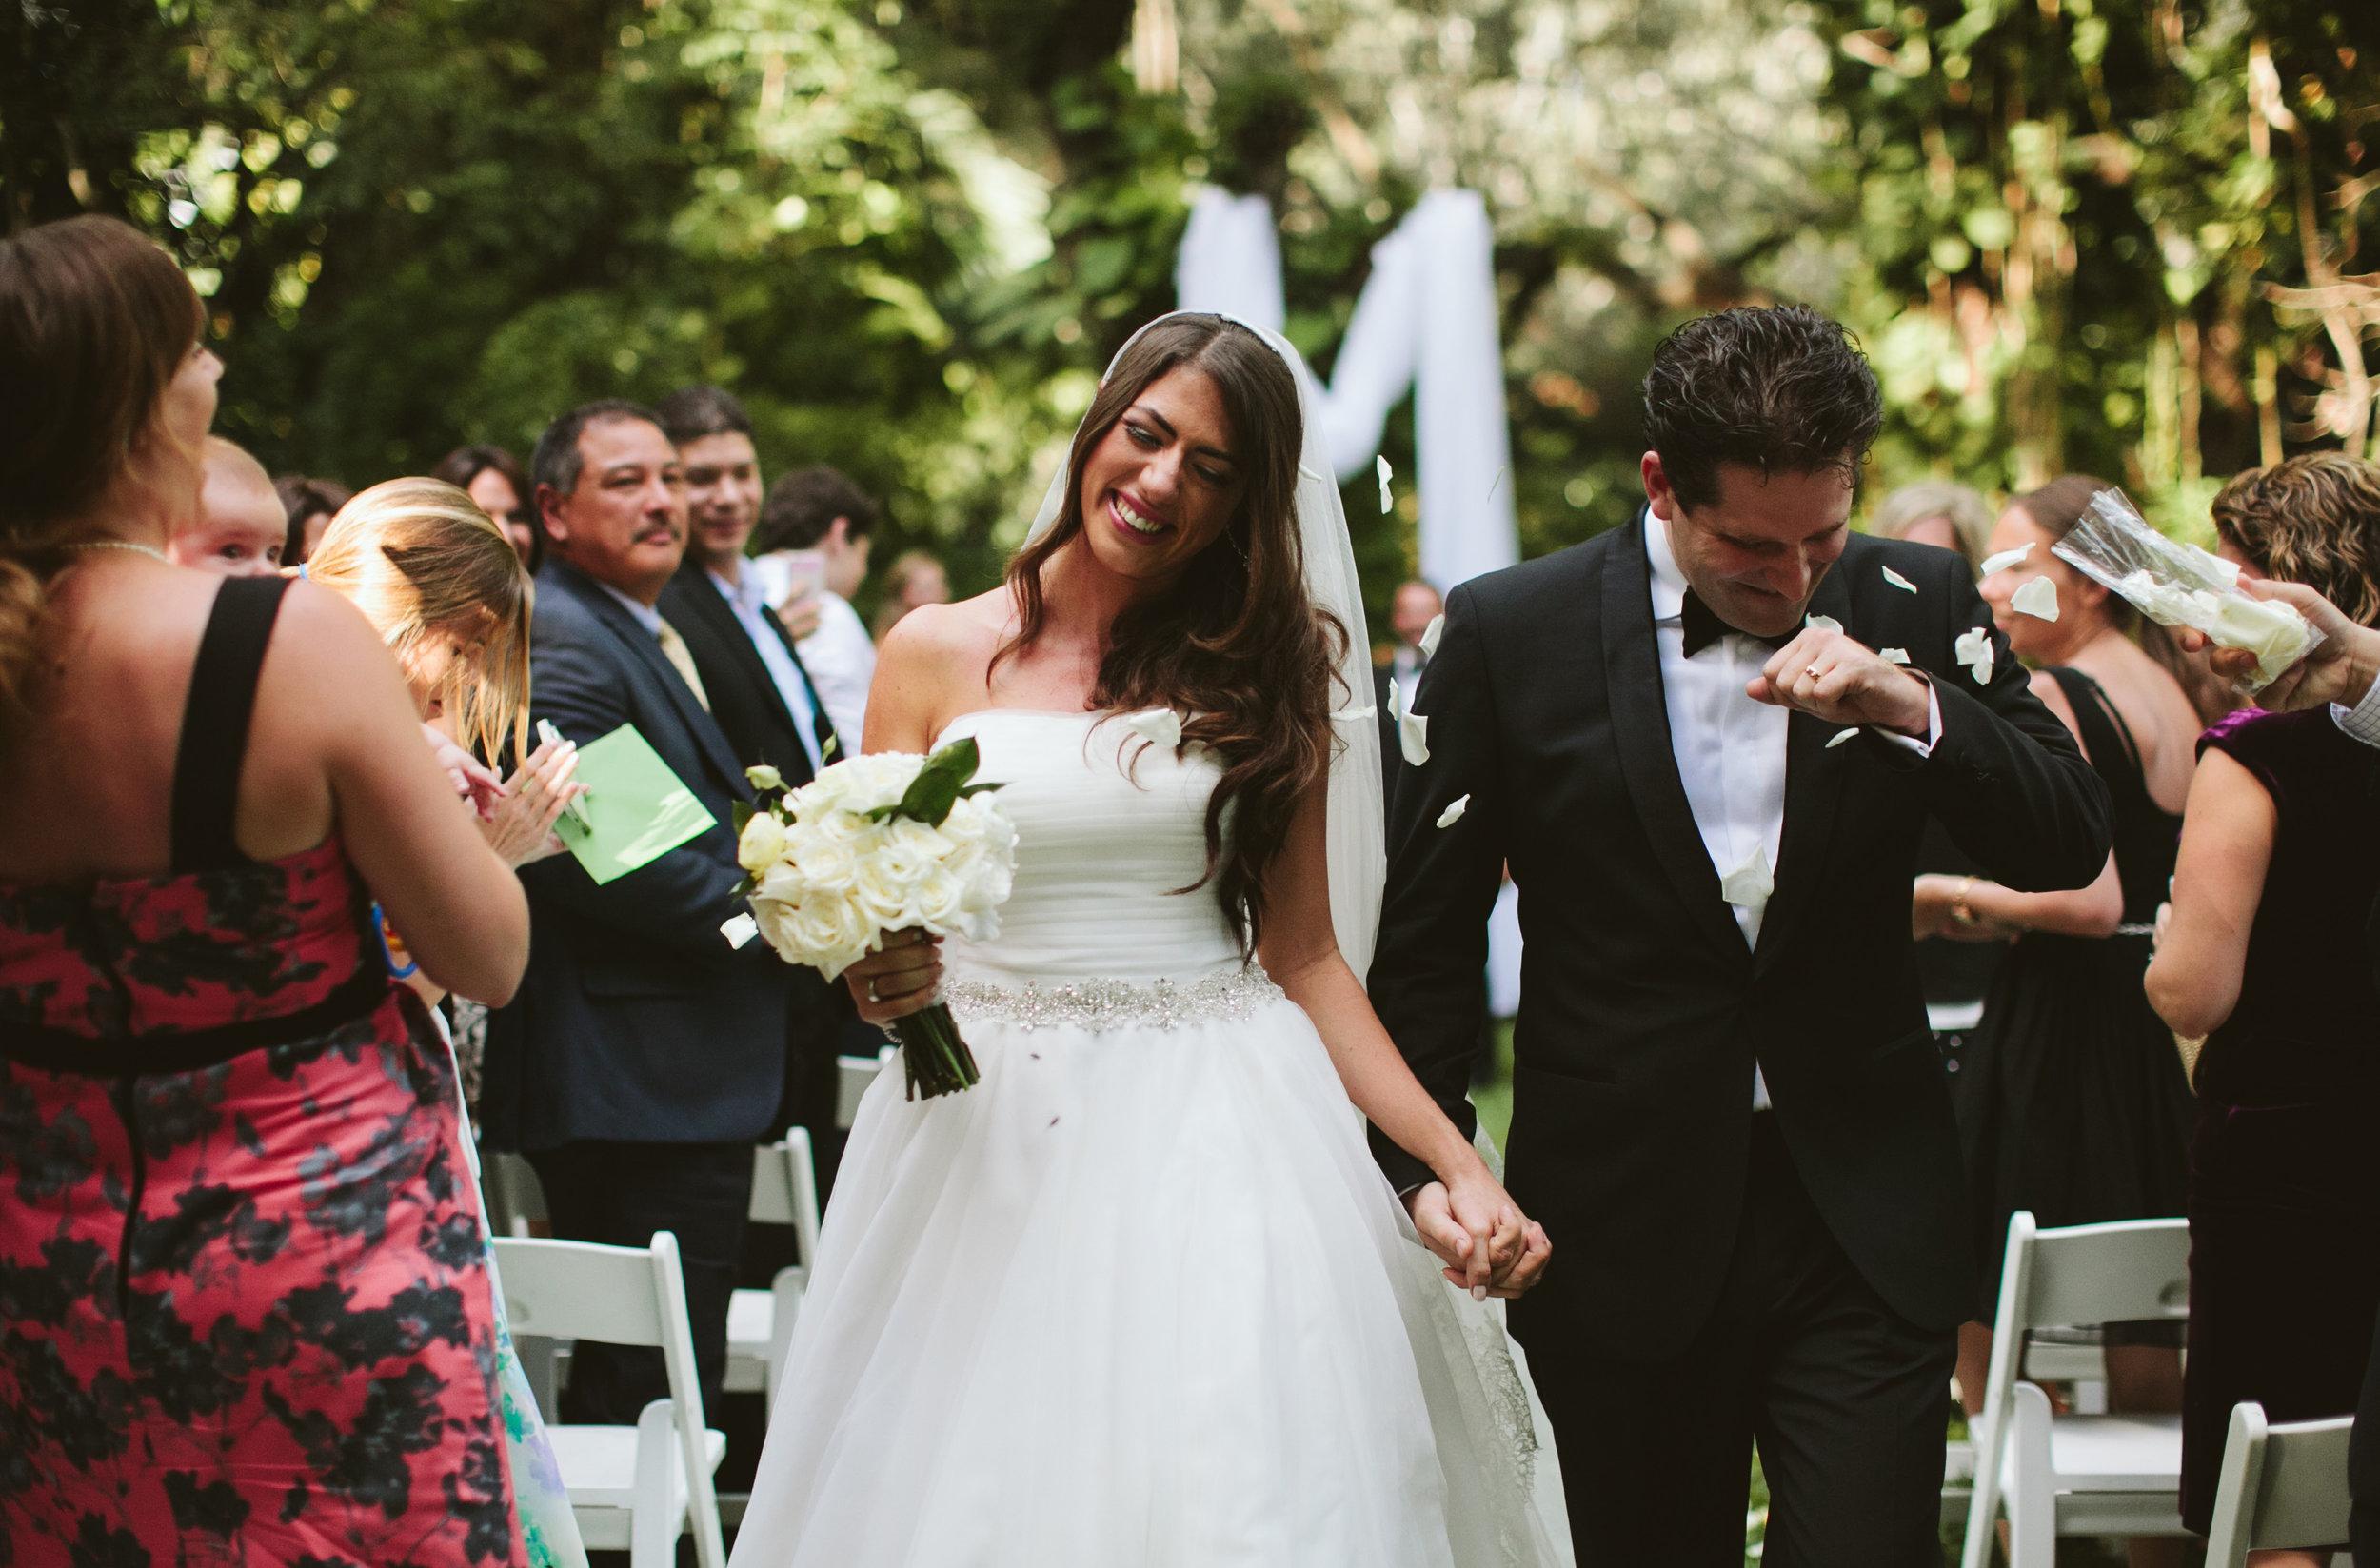 Meli + Mike Coconut Grove Wedding at Villa Woodbine58.jpg